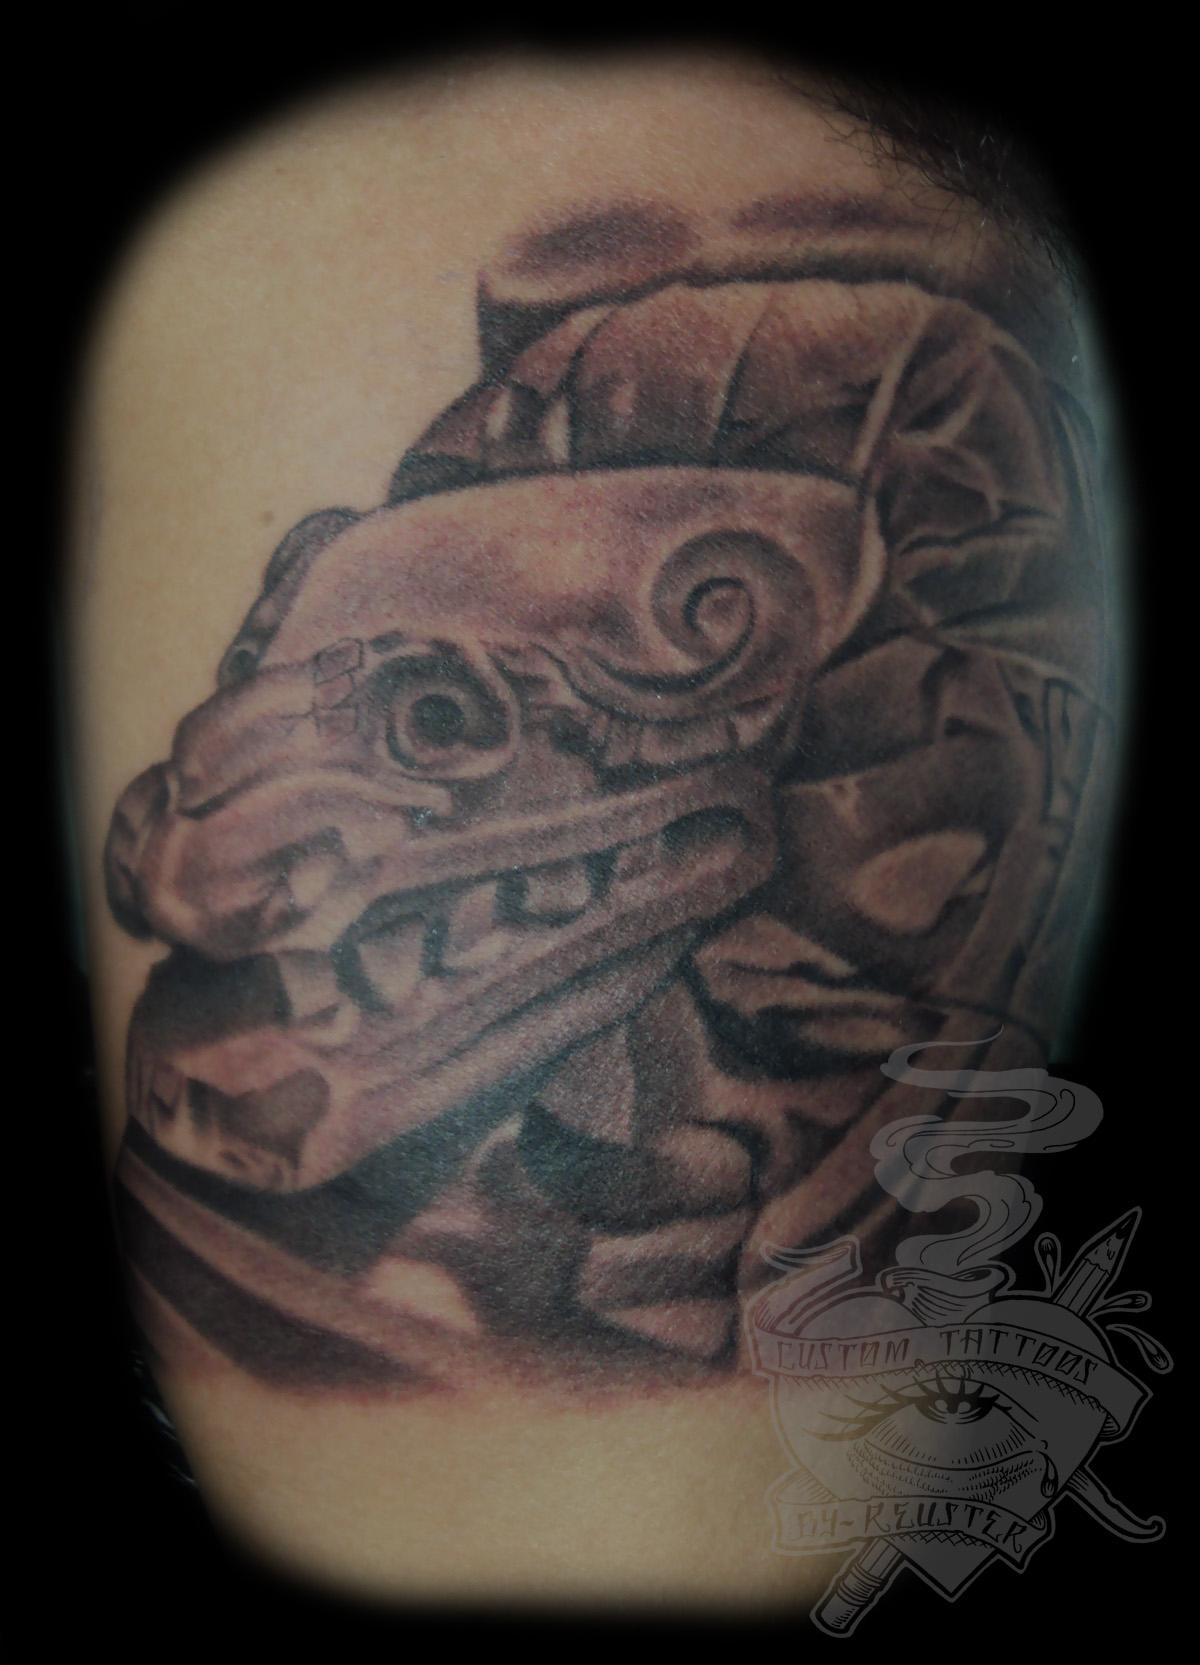 Aztec Temple Tattoo aztec tattoos: aztec tattoos – the beginnings of aztec tattoos